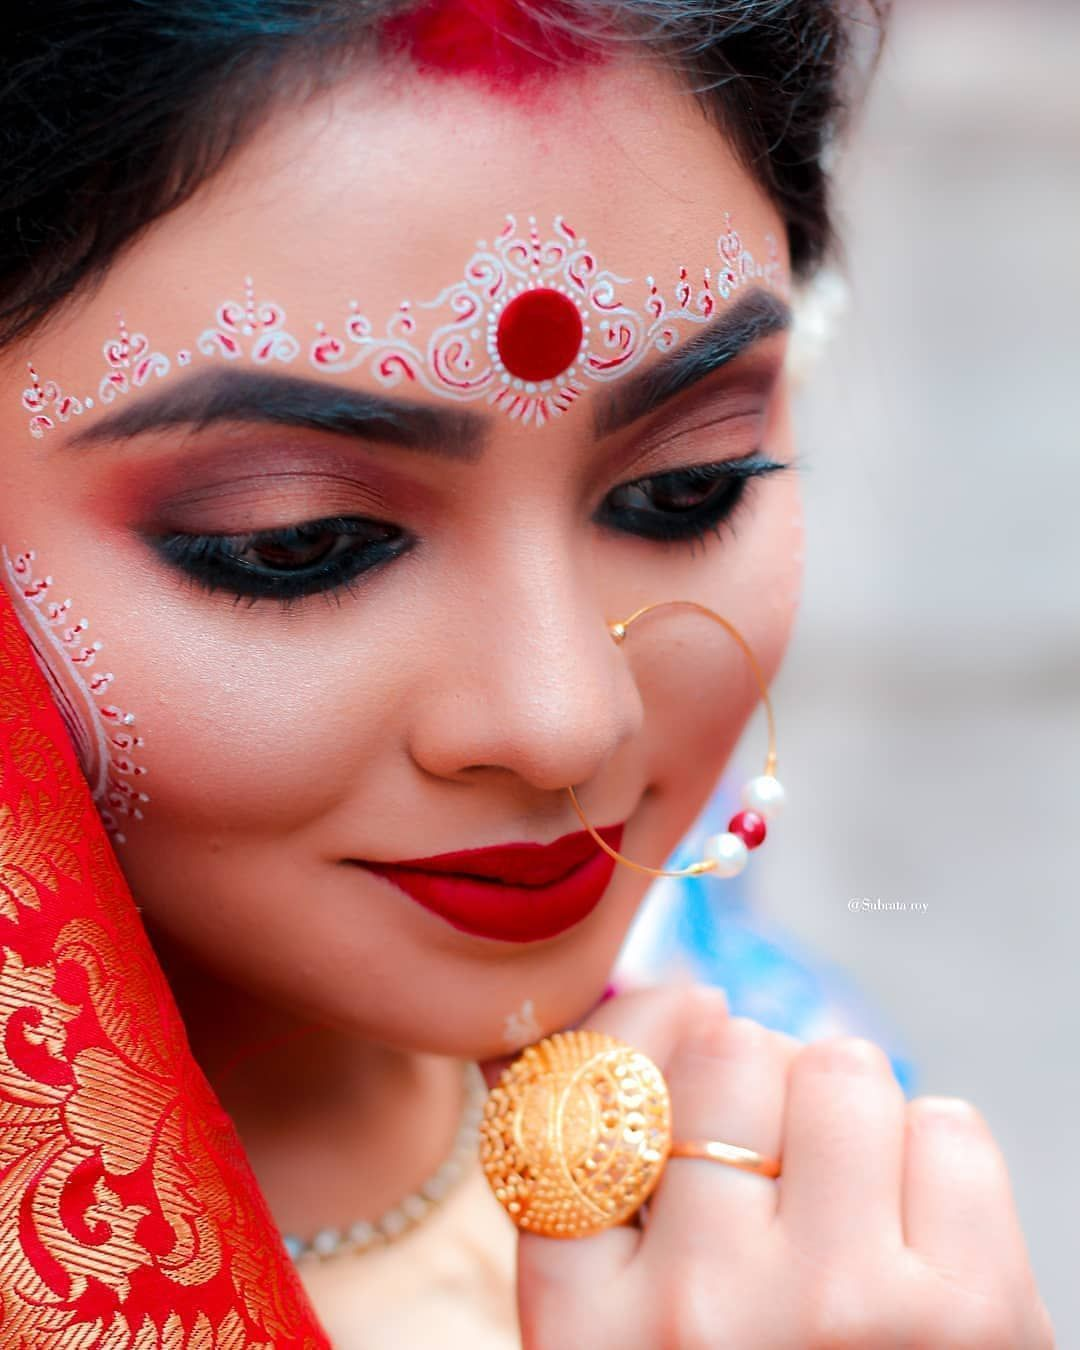 10 Bengali Bridal Kumkum Chandan Designs That Are Khuba Sundara Bengali Bridal Makeup Indian Bride Makeup Bengali Bride